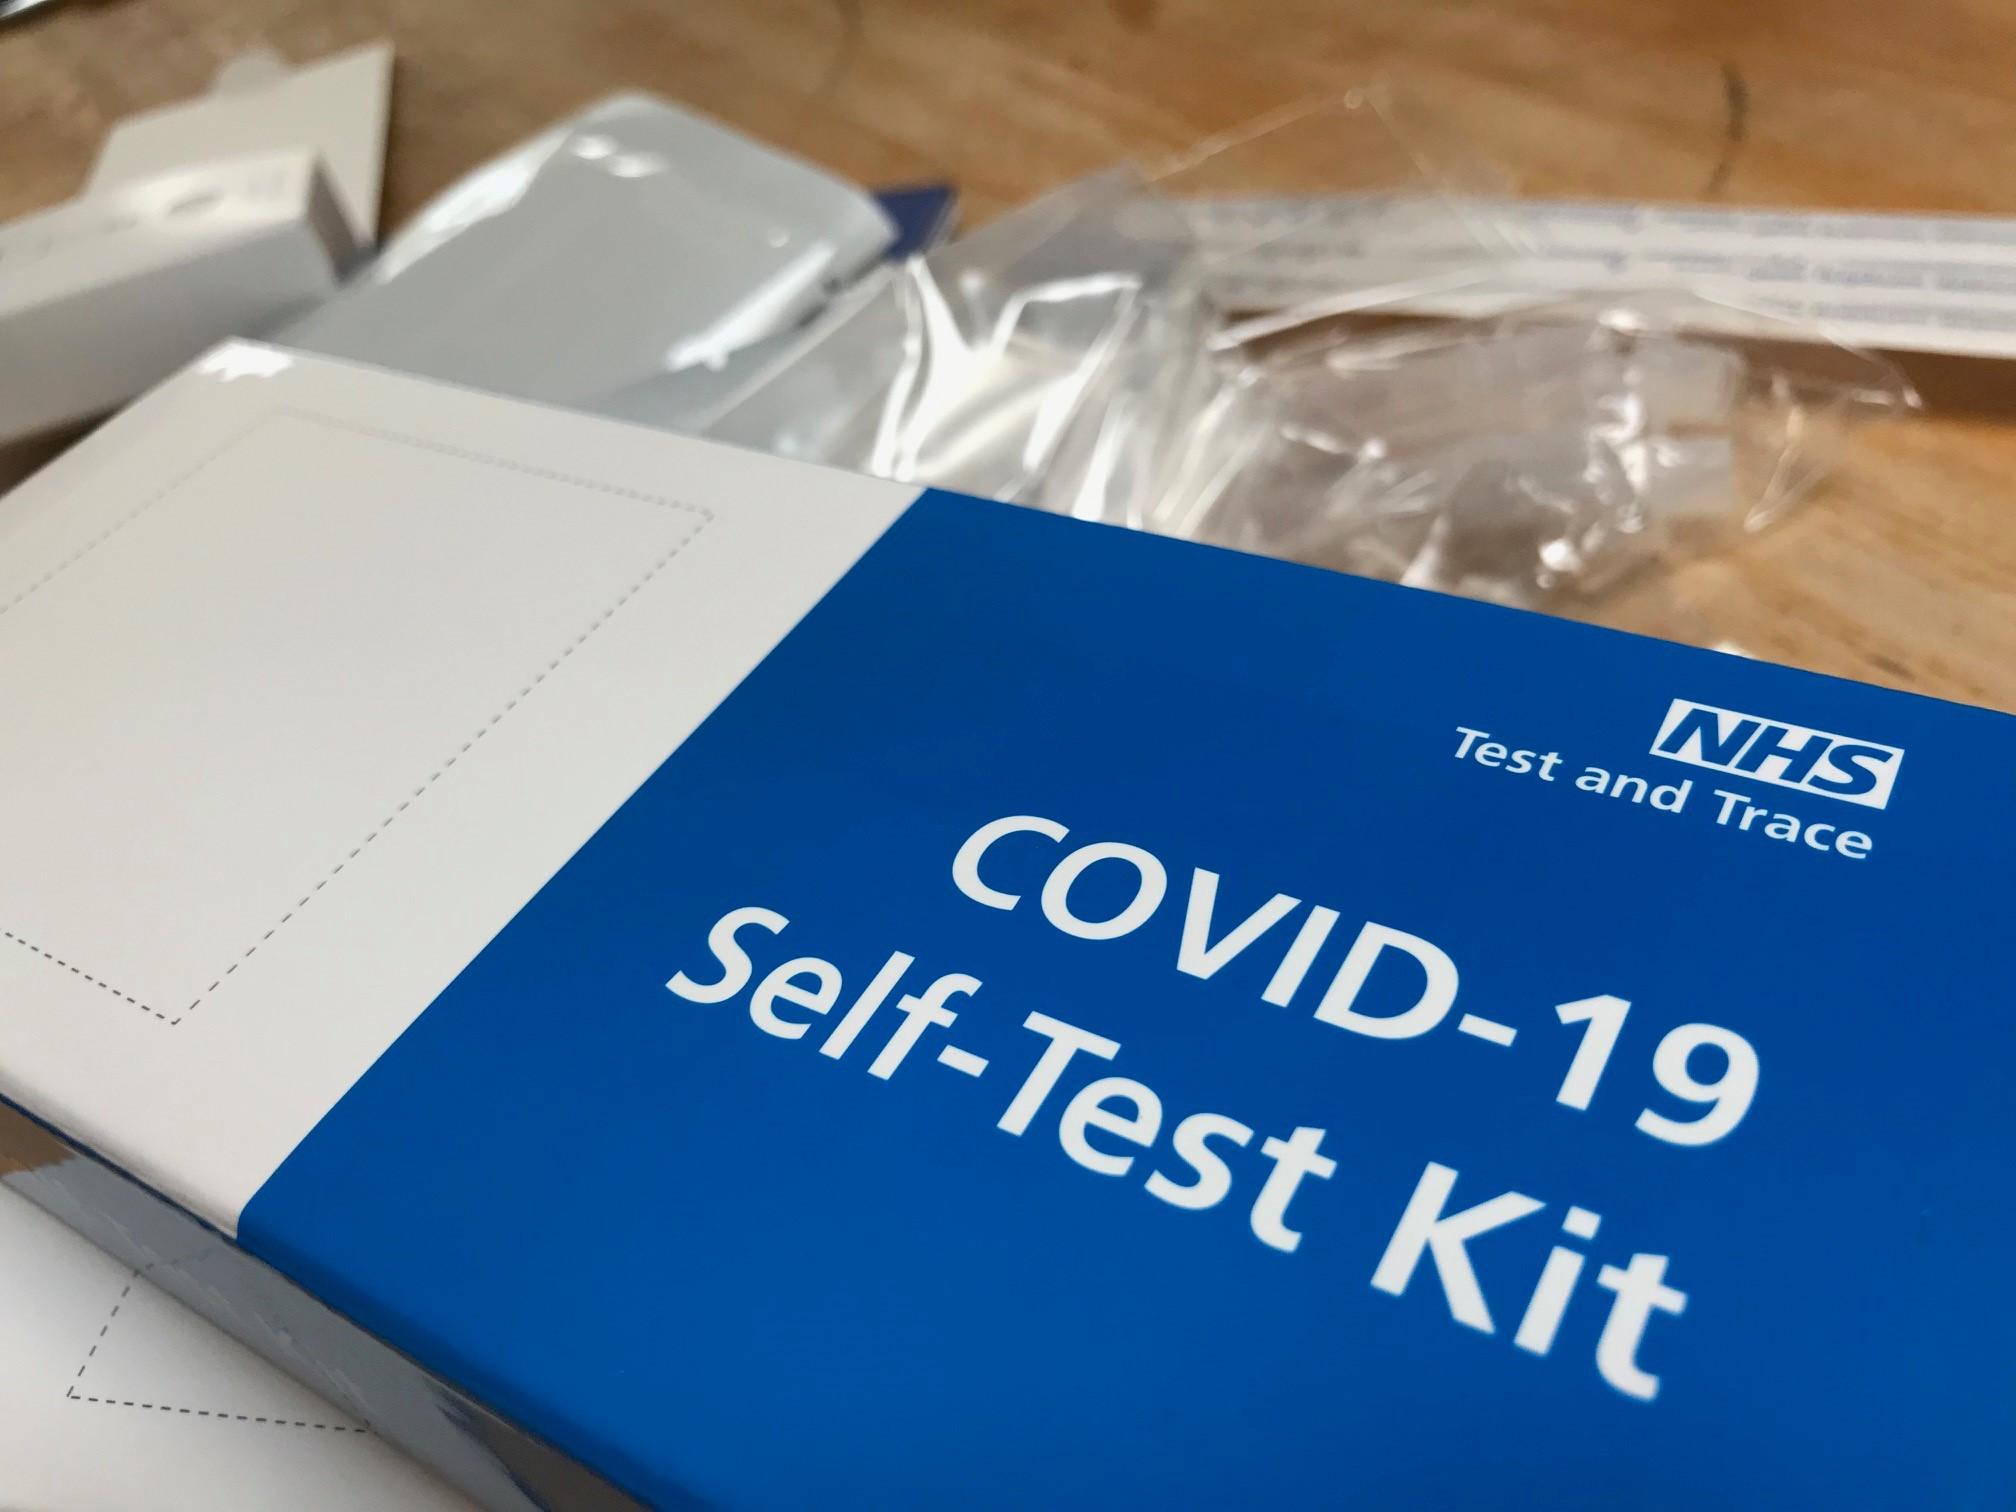 Image of covid-19 self test kit blue box